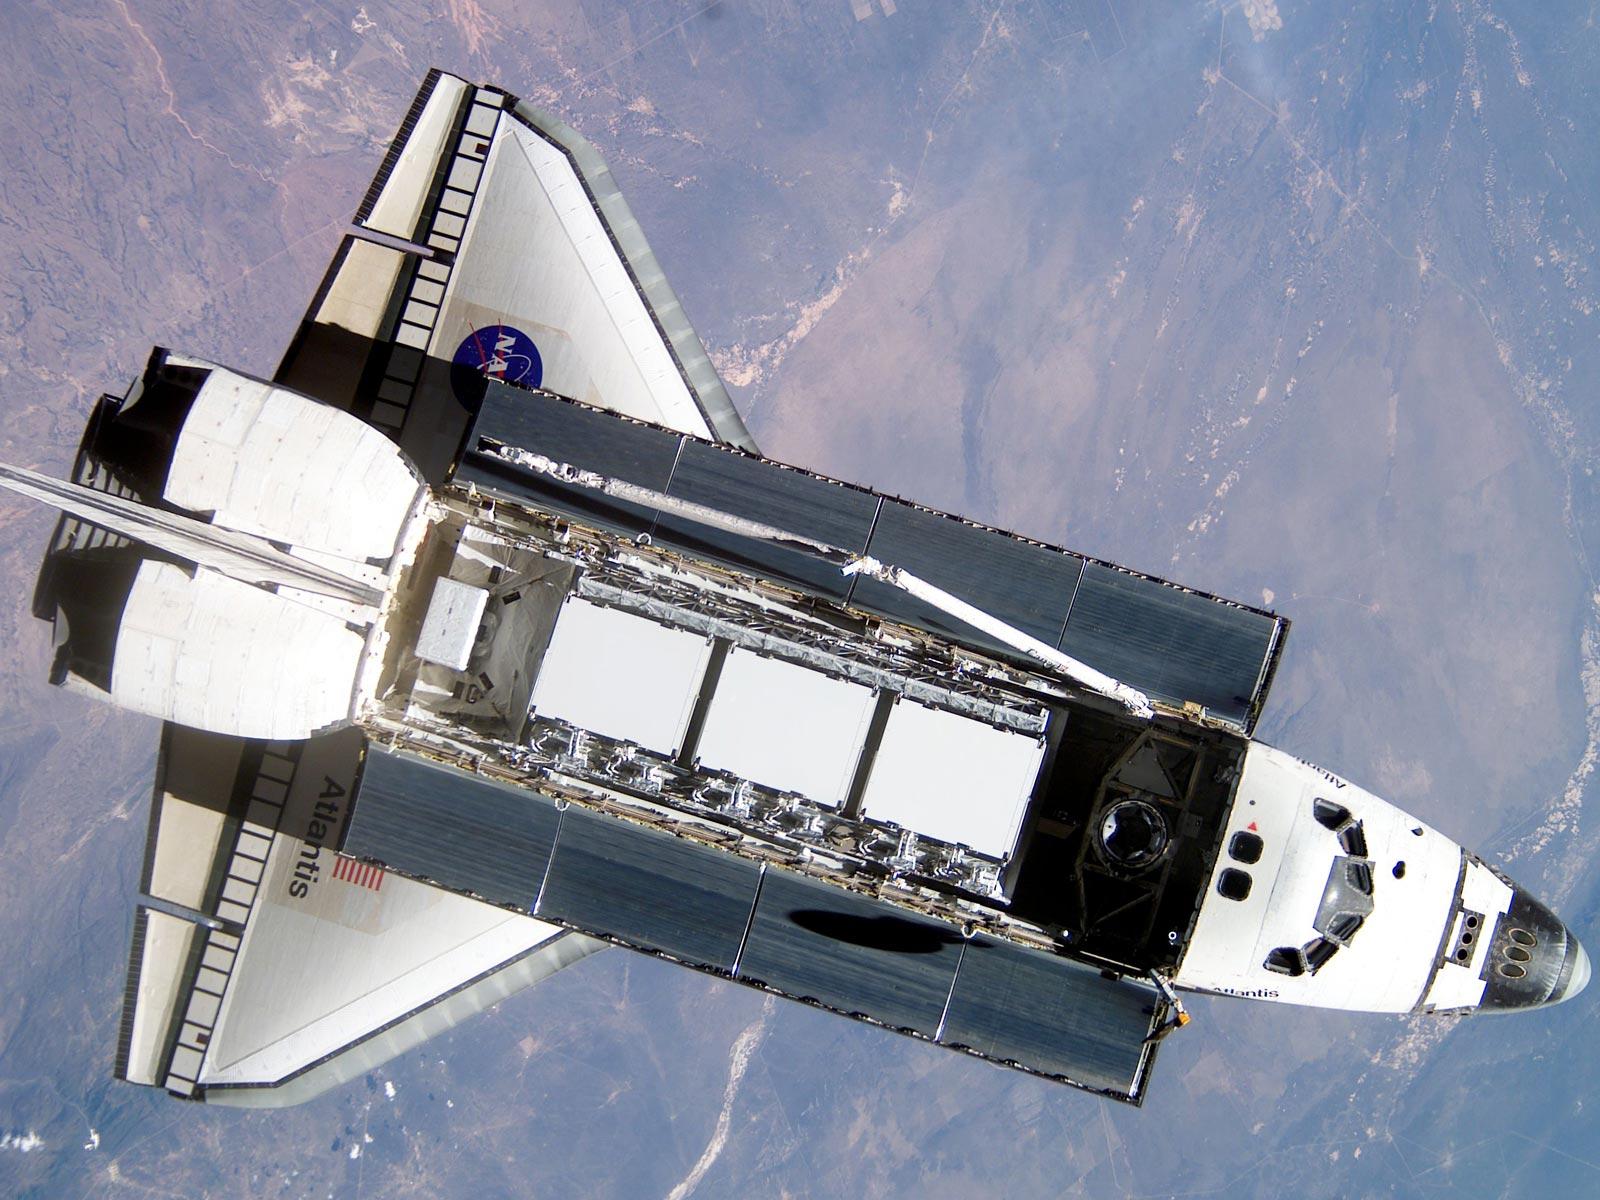 atlantis space shuttle di - photo #12